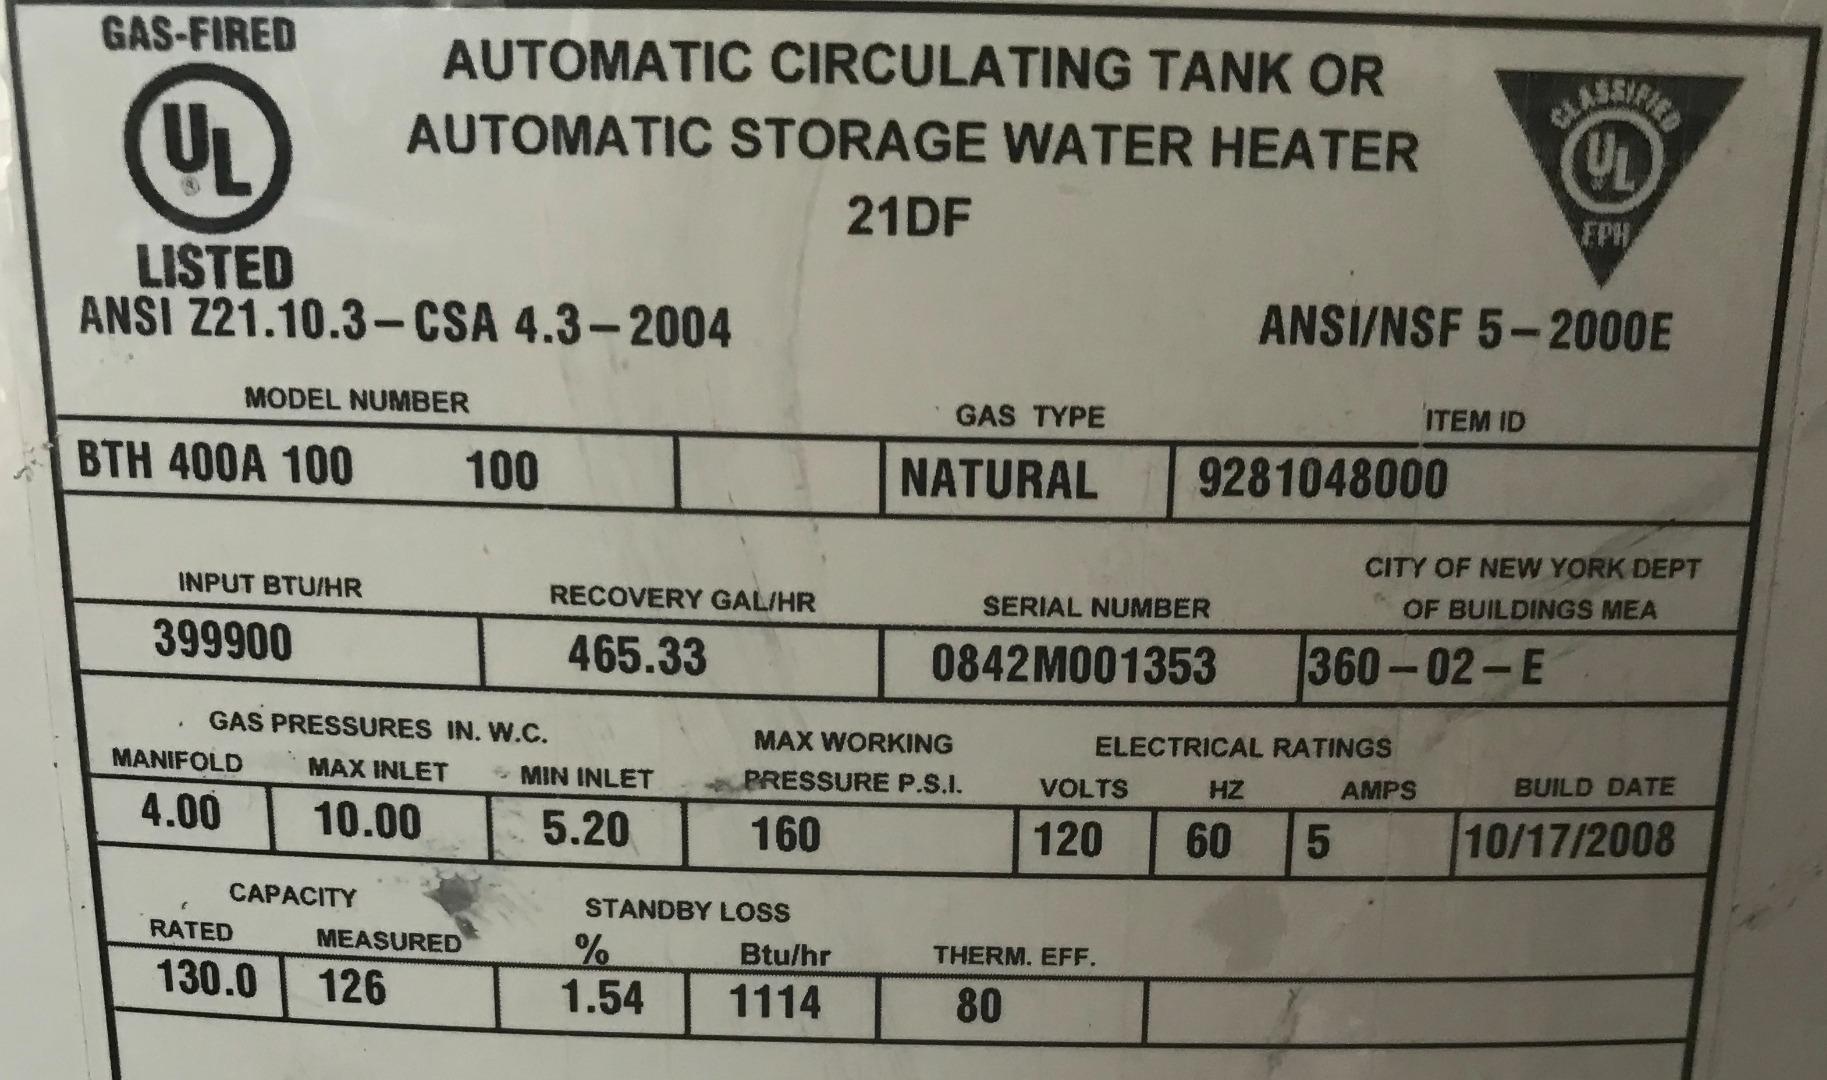 Used Ao Smith Bth 400a Cyclone Xi 119 Gallon Commercial